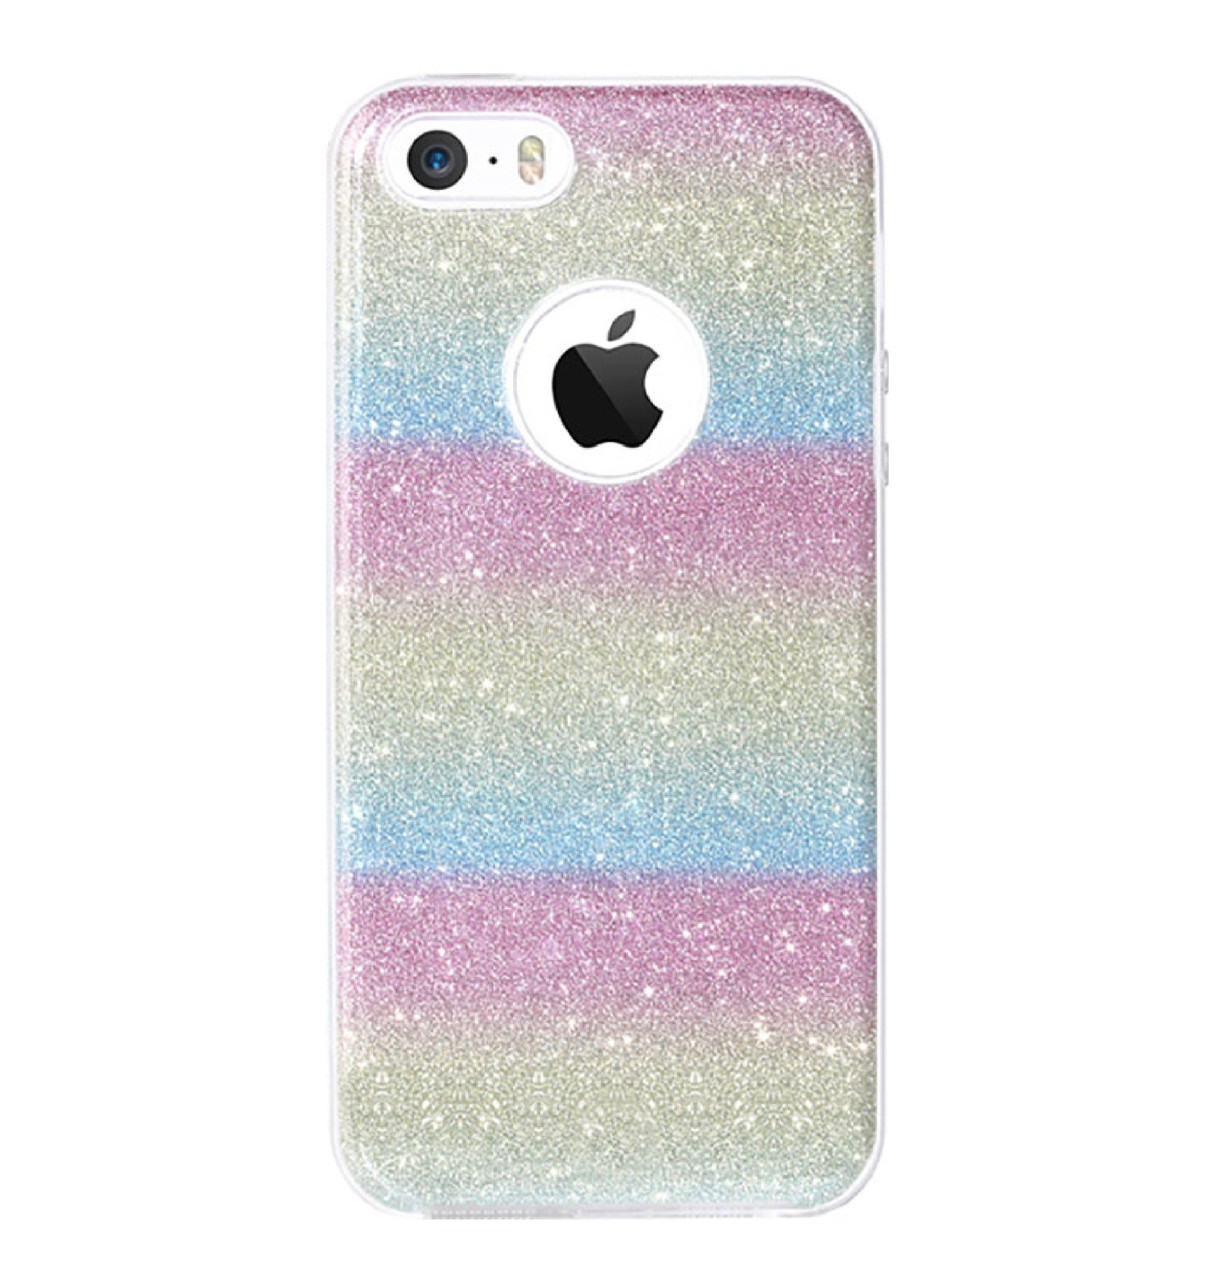 Чехол-накладка TOTO TPU Case Rose series на IPhone 5 / 5s / SE Rainbow